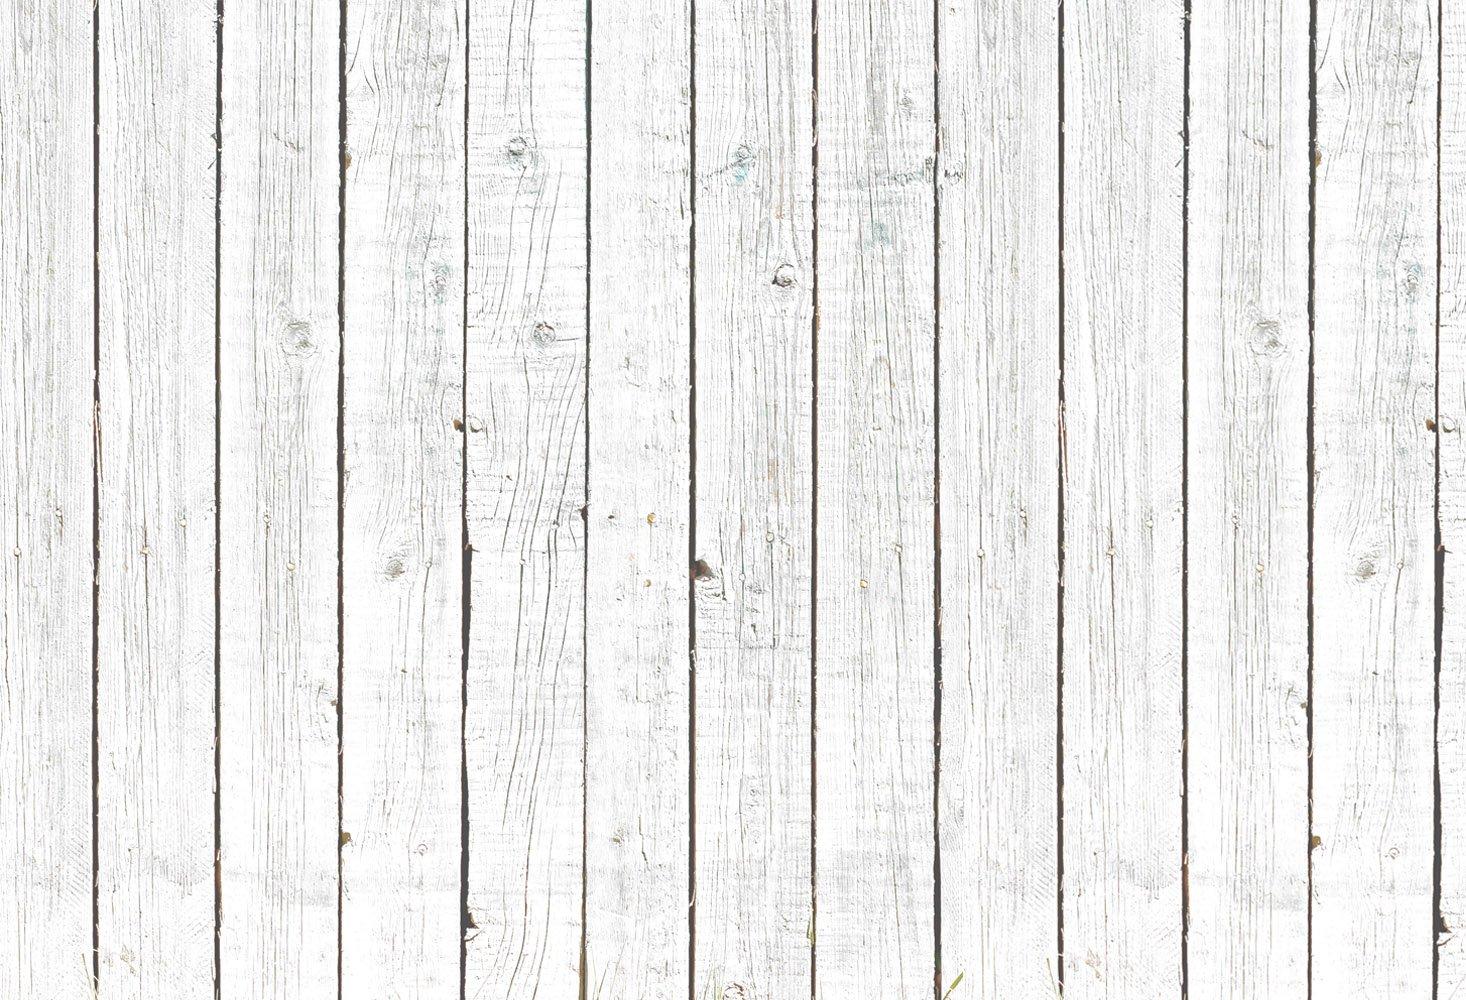 Amazon.com : Muzi Vintage Wooden Floor Photography Backdrop White Wood Planks Digital Printed Studio Photo Background 7x5ft D-9738 : Camera & Photo